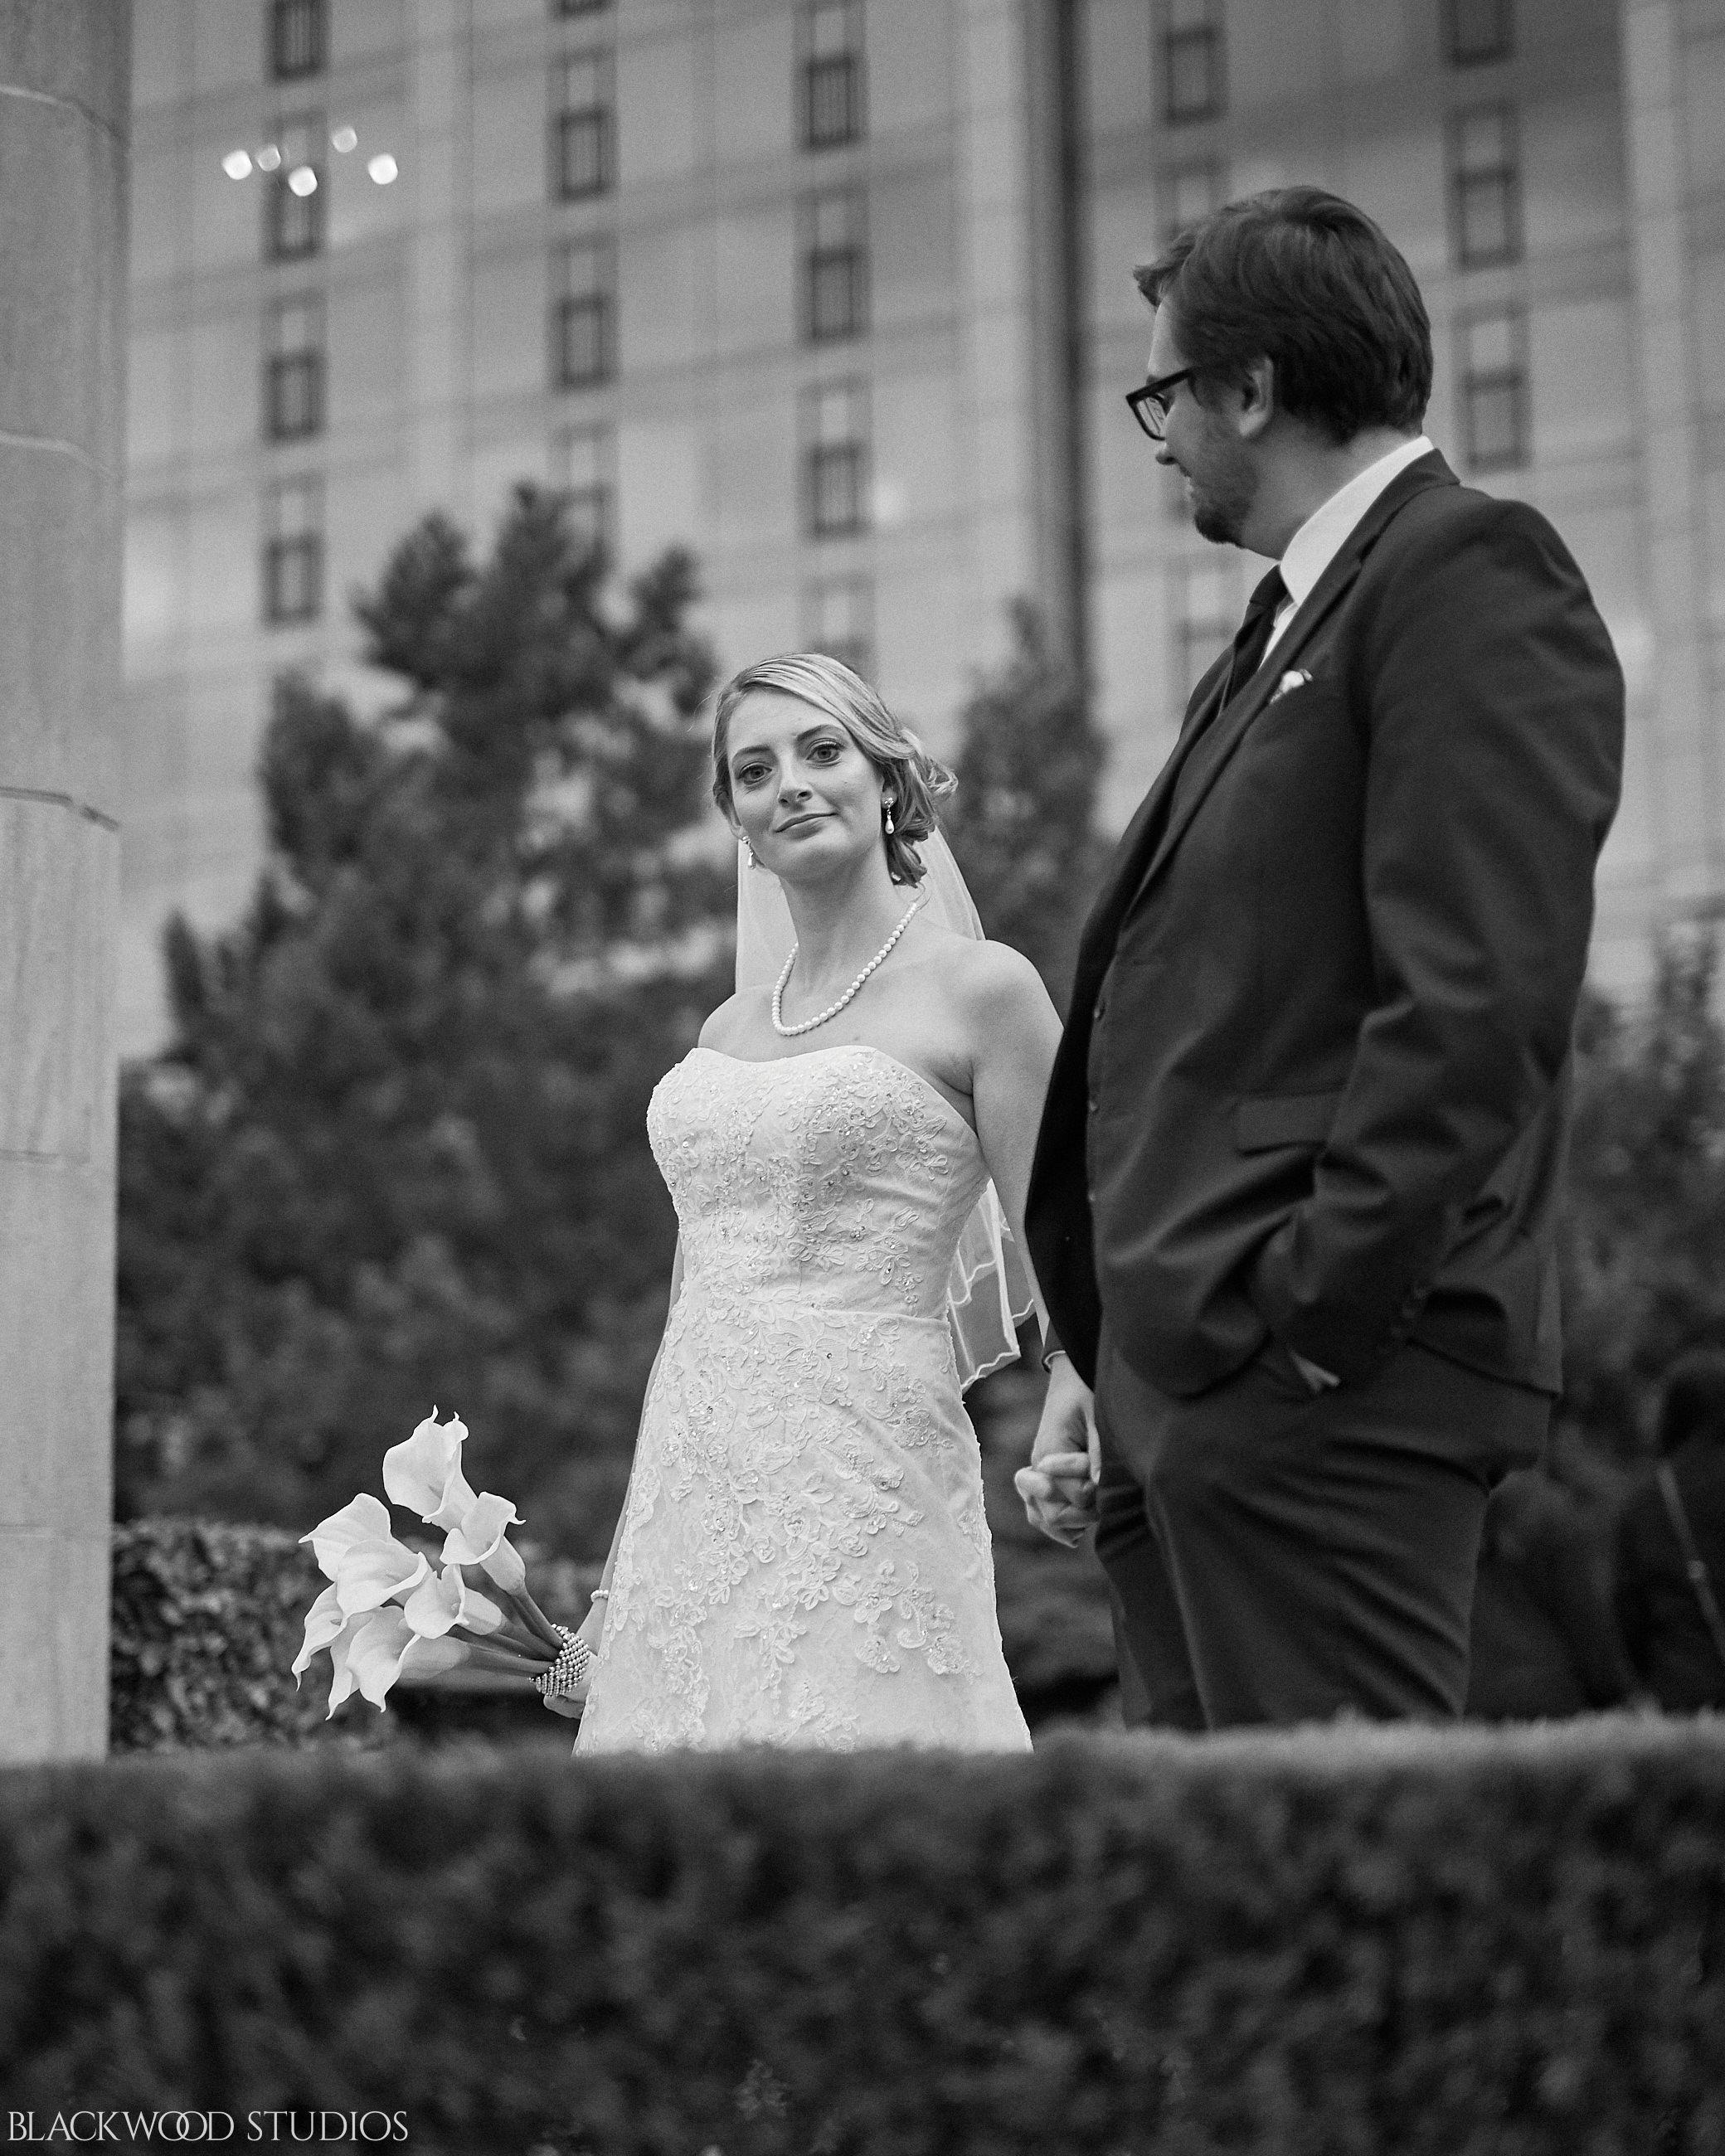 Blackwood-Studios-Wedding-Photography-20170928-185514-Marek-Katie-Michalek-Oakes-Garden-Theatre-Niagara-Falls-Ontario-Canada.jpg